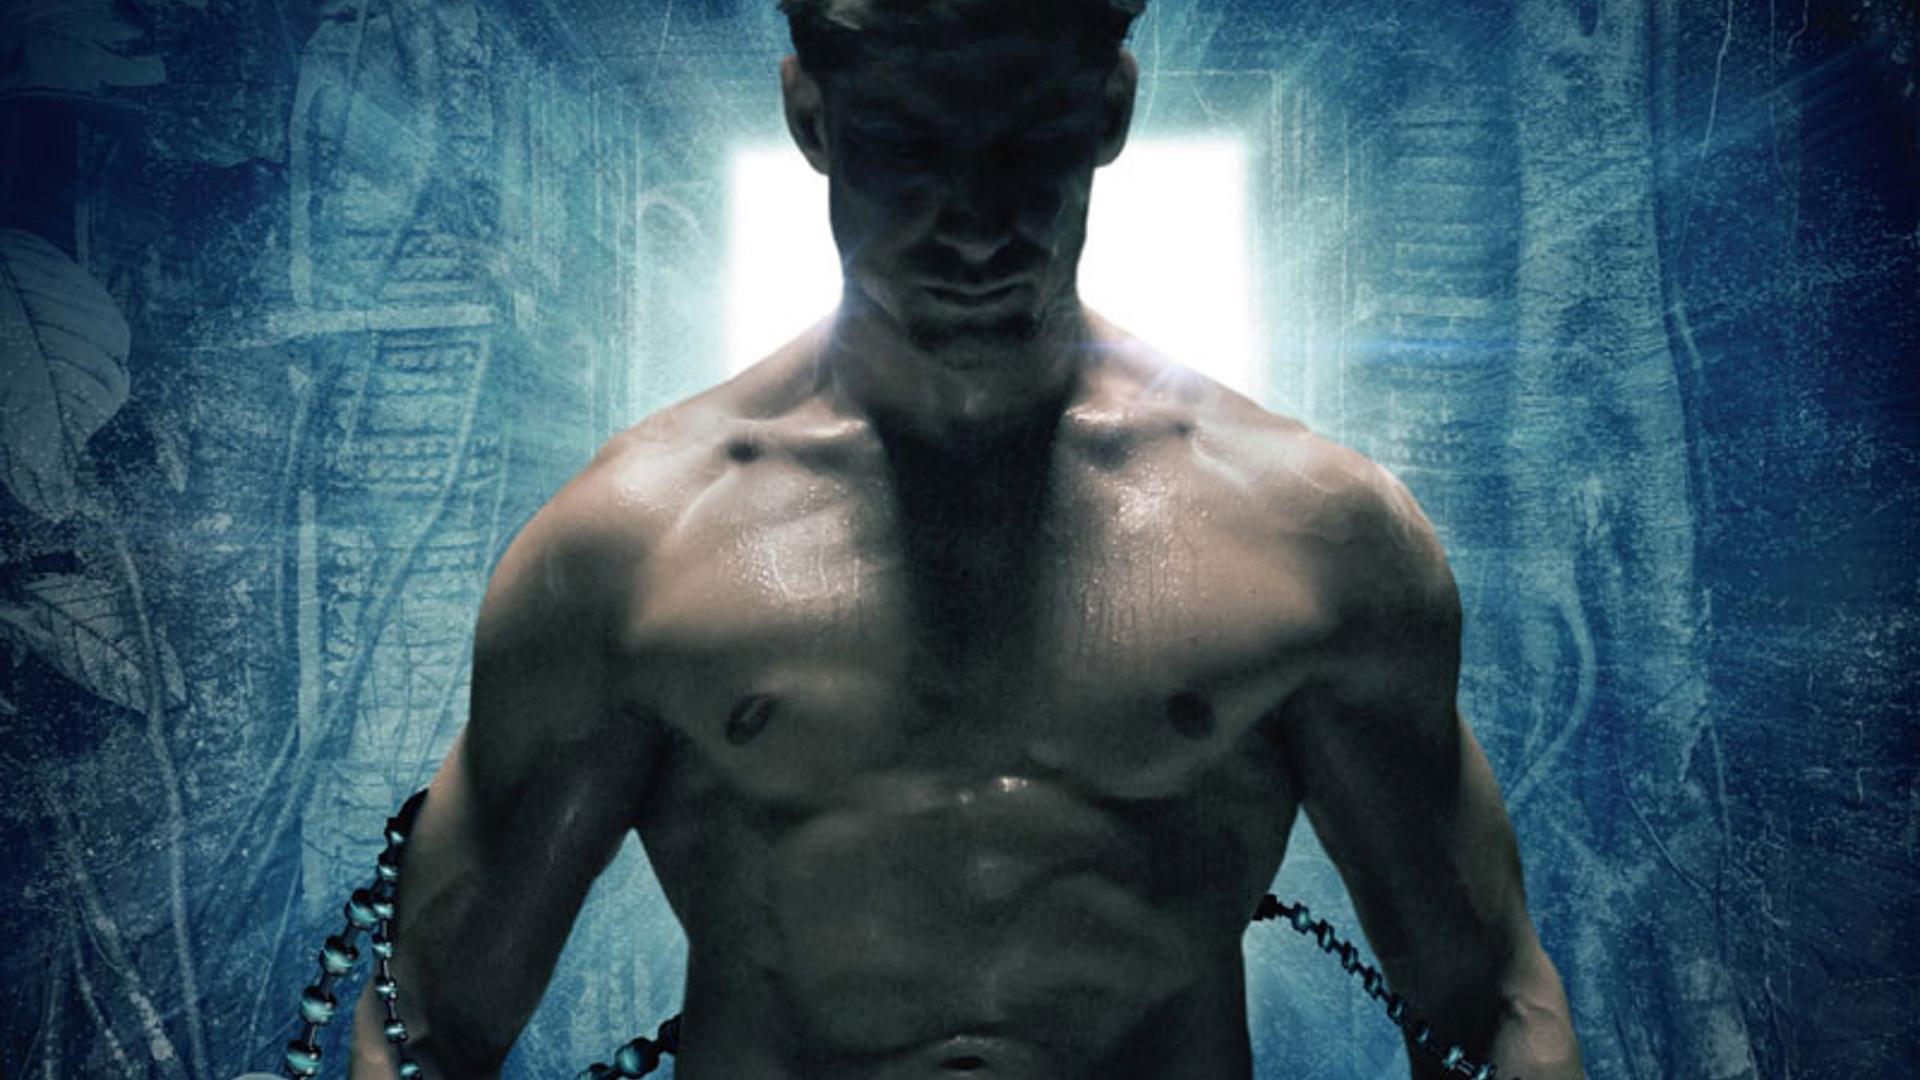 tony-jaa-and-frank-grillo-join-nicolas-cage-in-the-film-adaptation-of-the-sci-fi-action-comic-jiu-jitsu-social.jpg